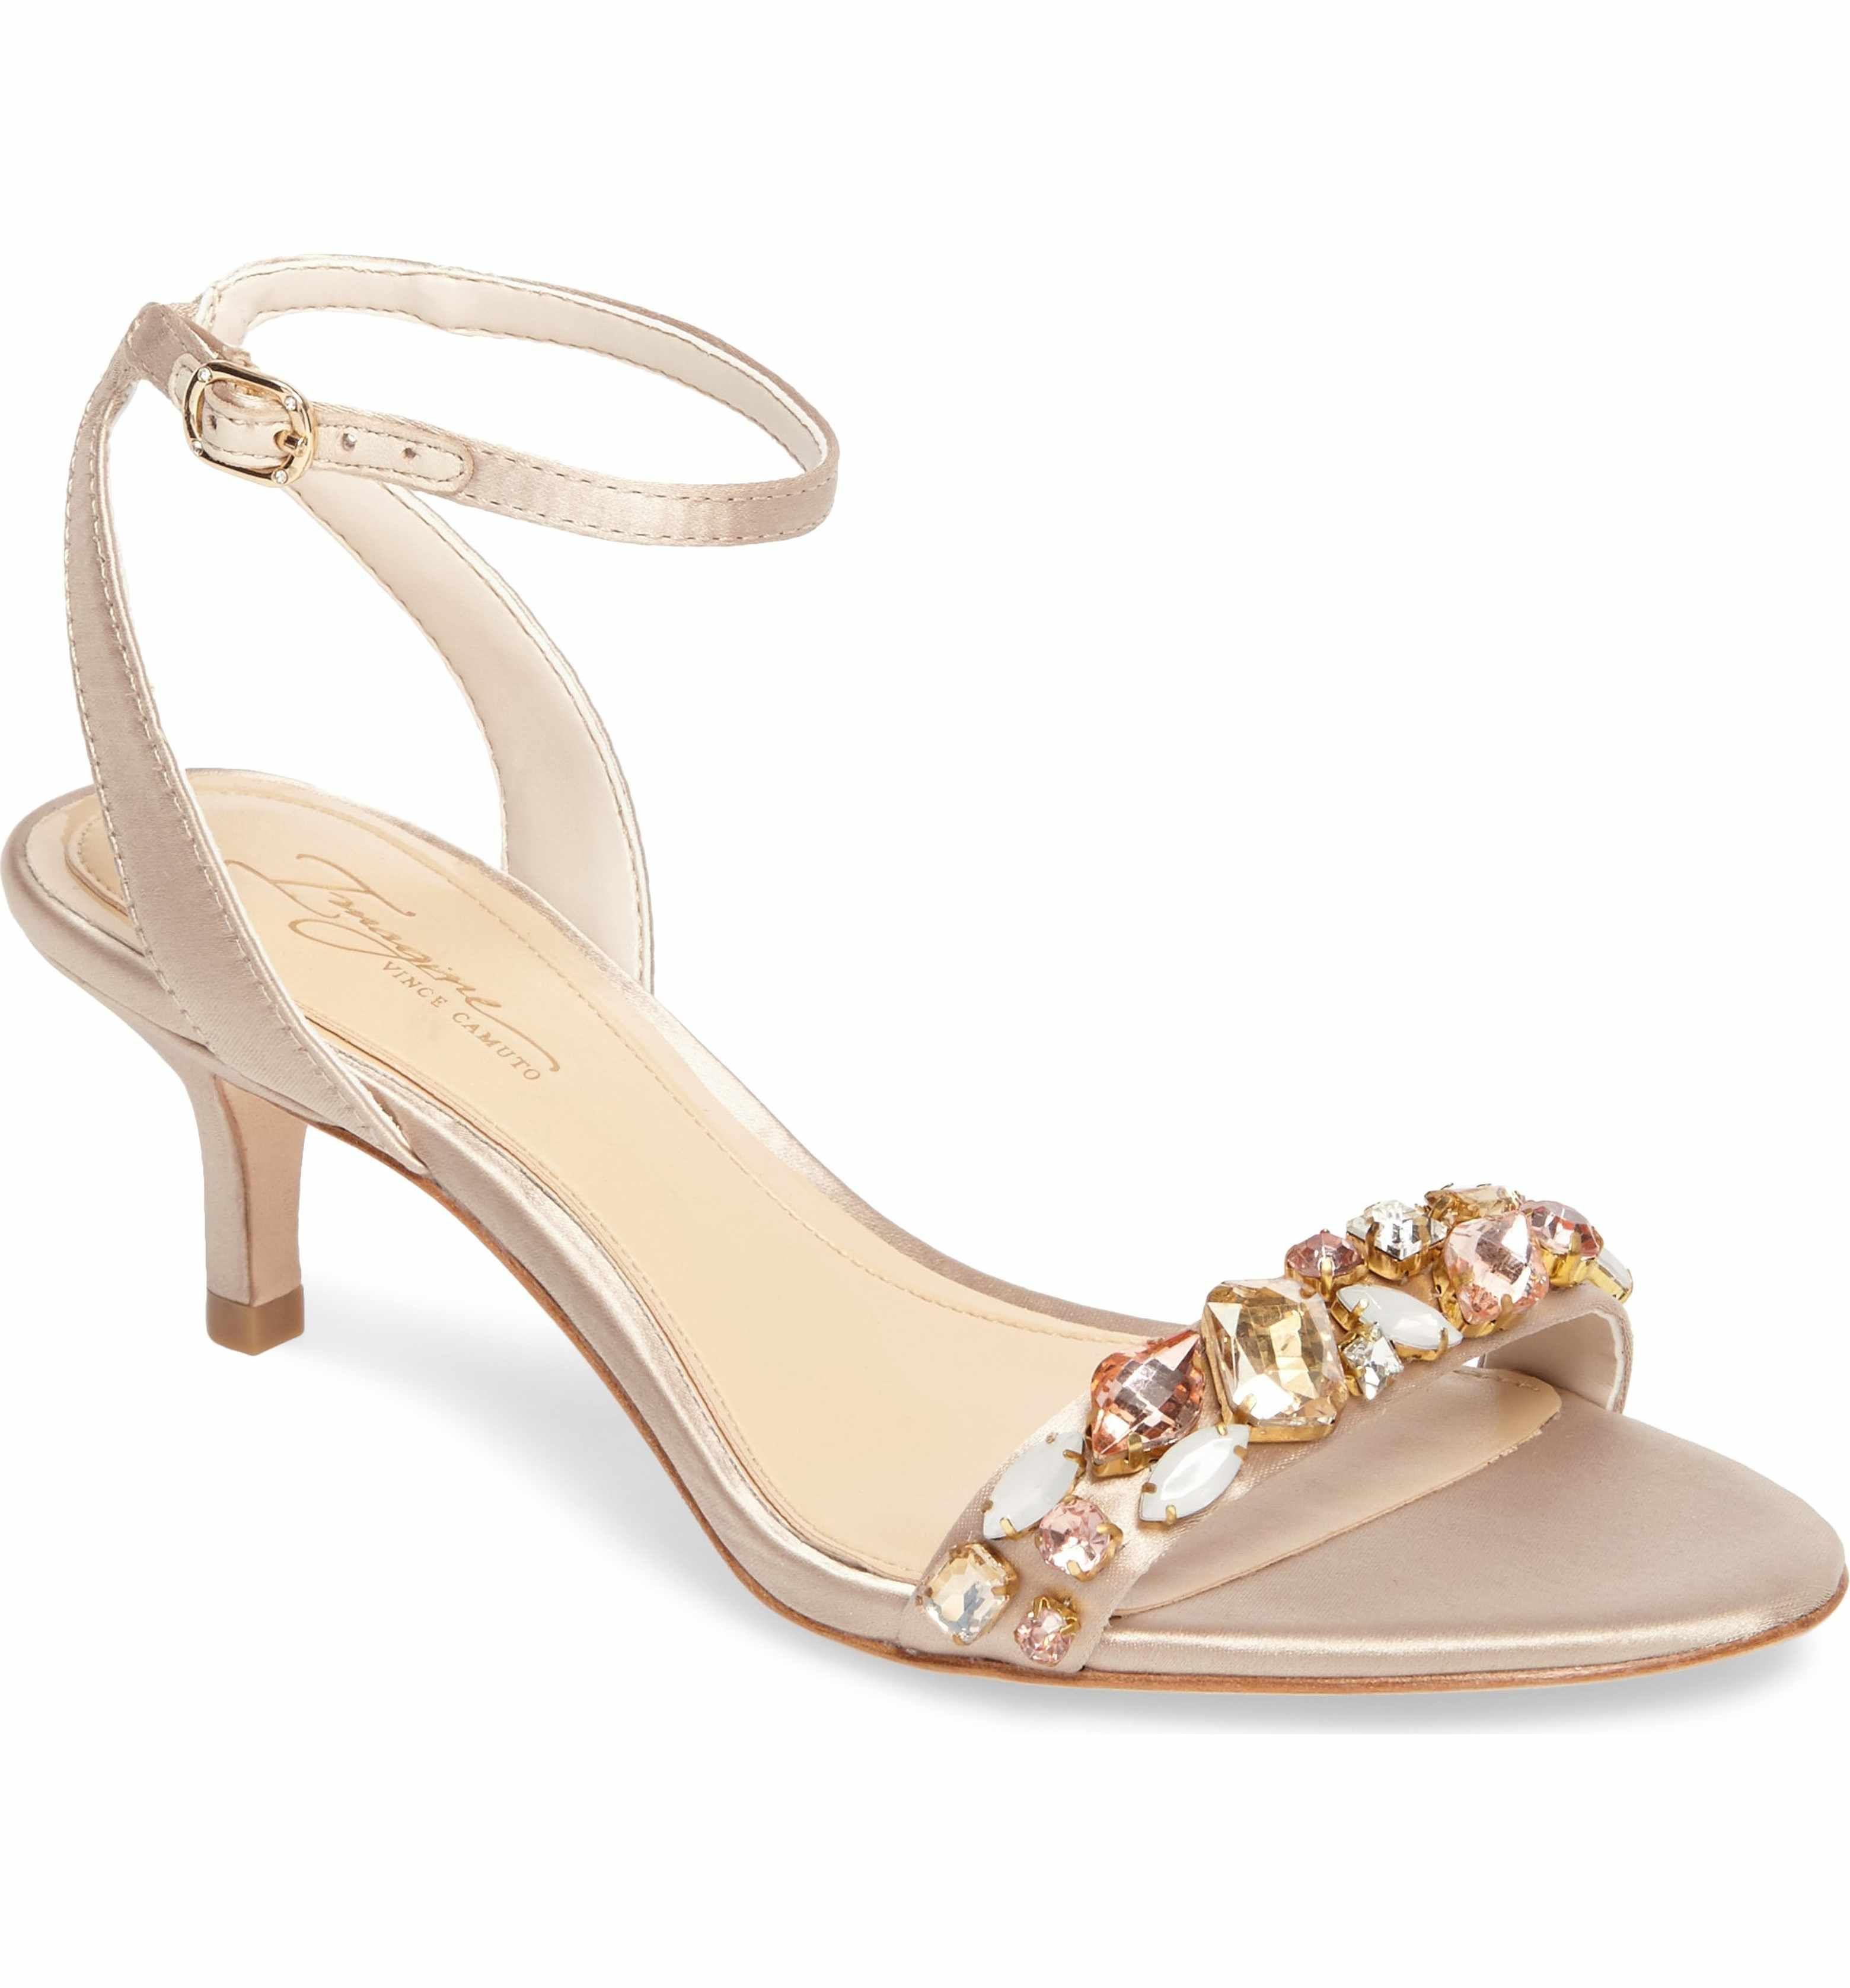 Vince Camuto Women's Imagine Vince Camuto Kolo Embellished Kitten Heel Sandal zfomck